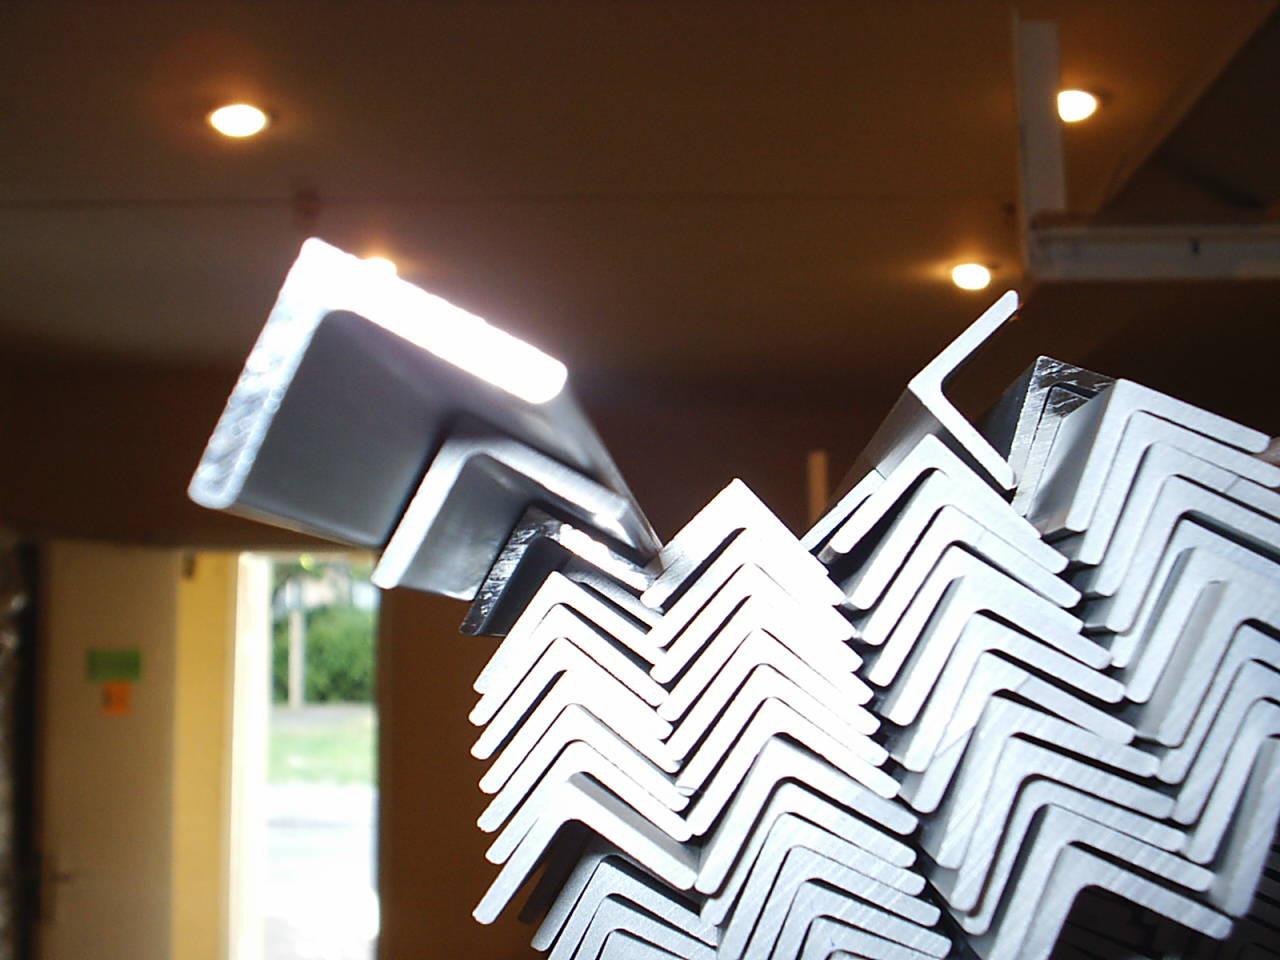 Алюминиевый профиль уголок 15x15x1.5, 15x15x2,0, 20x20x1.5 АД31 Т5 порезка доставка купить цена